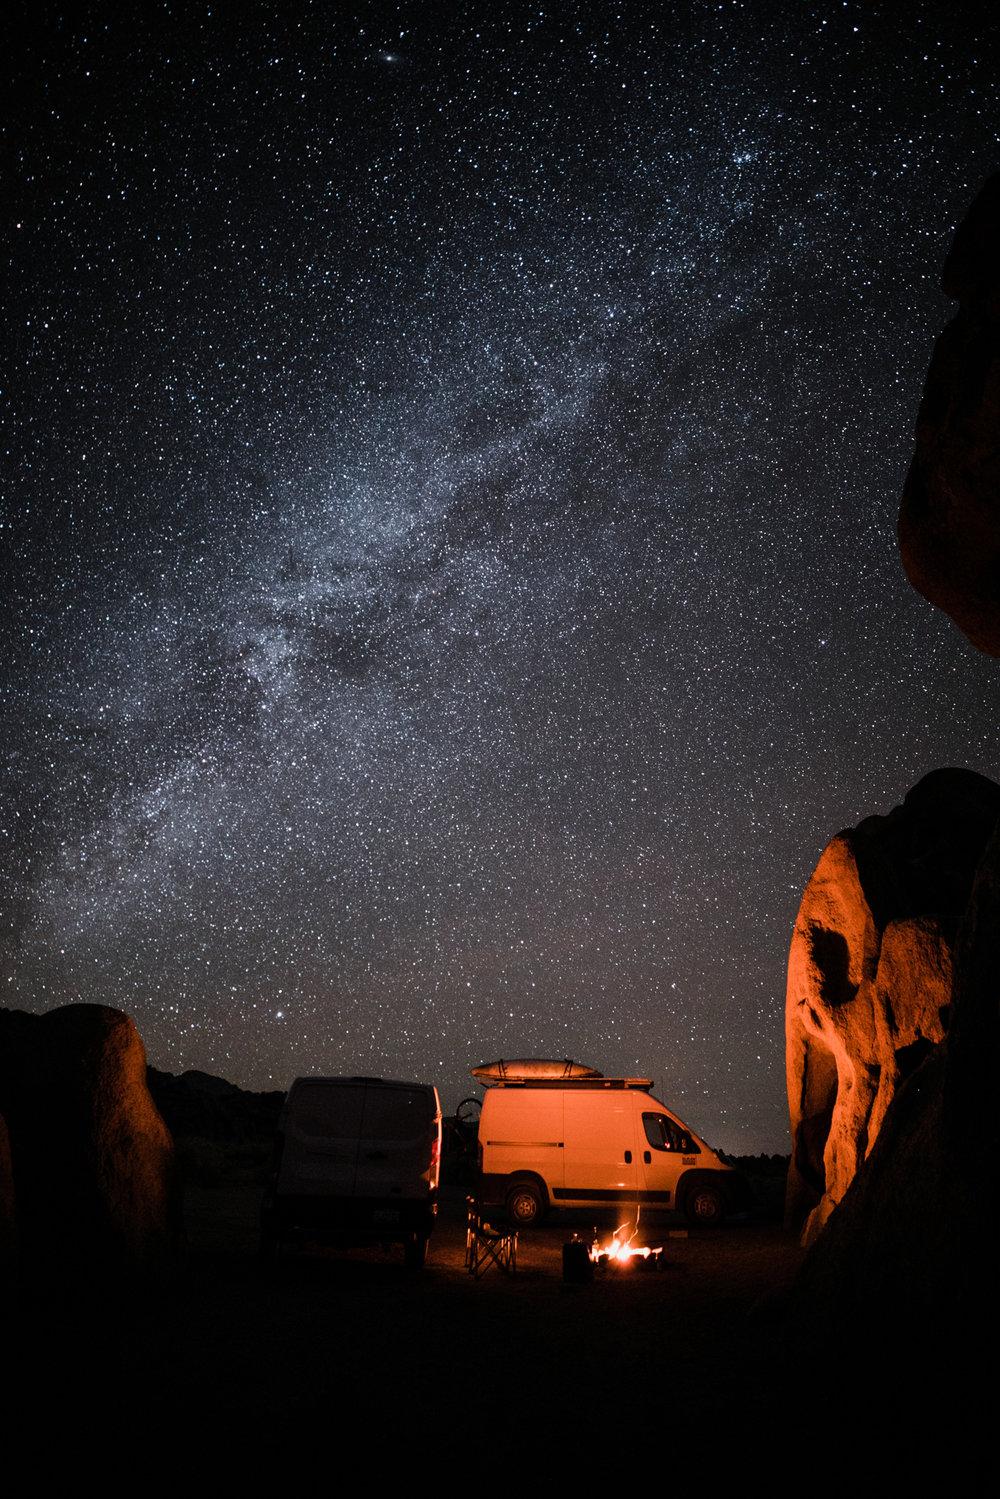 camping in california desert | utah and california adventure elopement photographers | the hearnes adventure photography | www.thehearnes.com